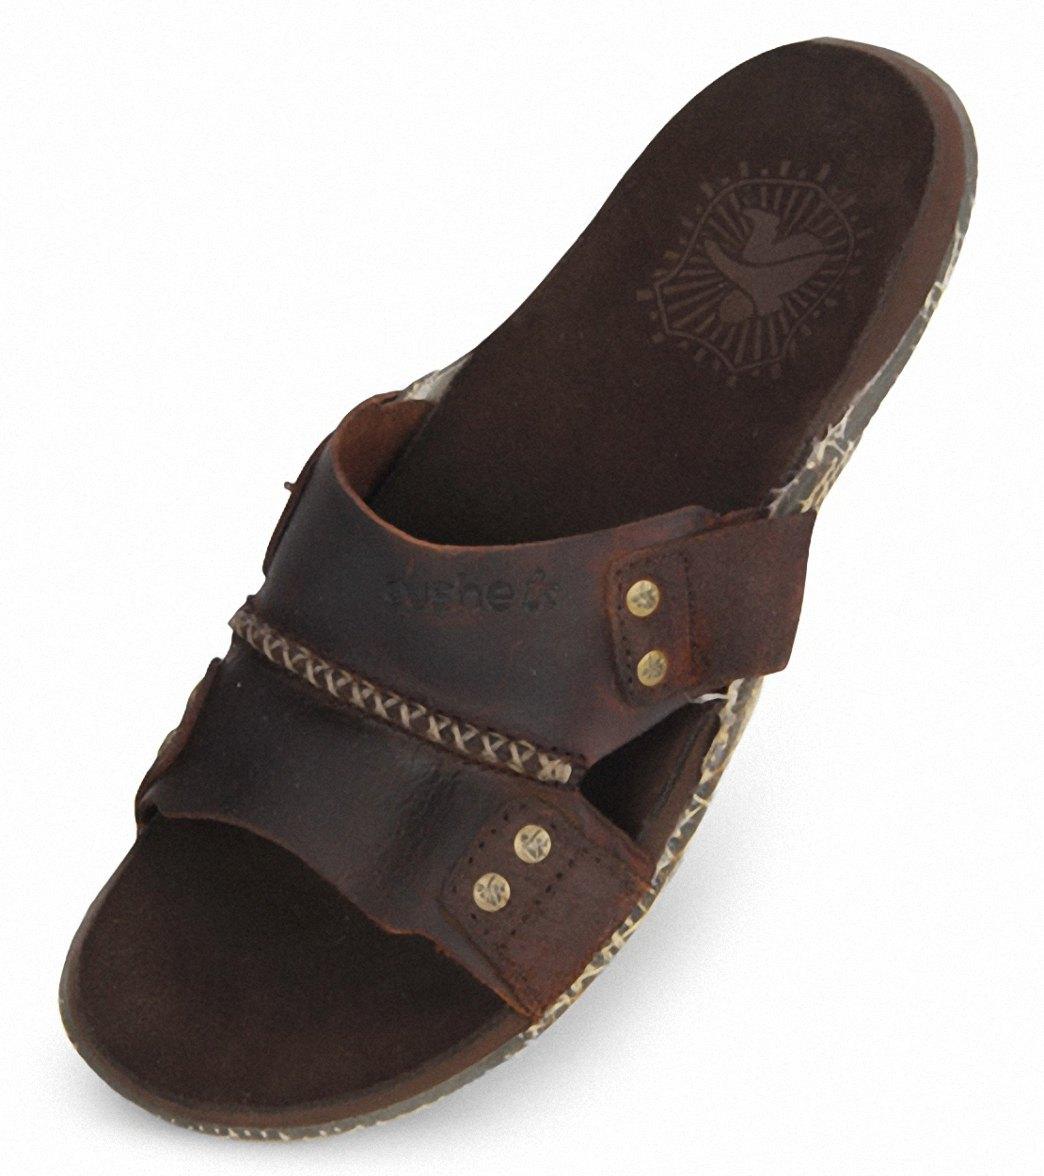 22b22bd2c837 Cushe Men s Manuka Slide Sandals at SwimOutlet.com - Free Shipping